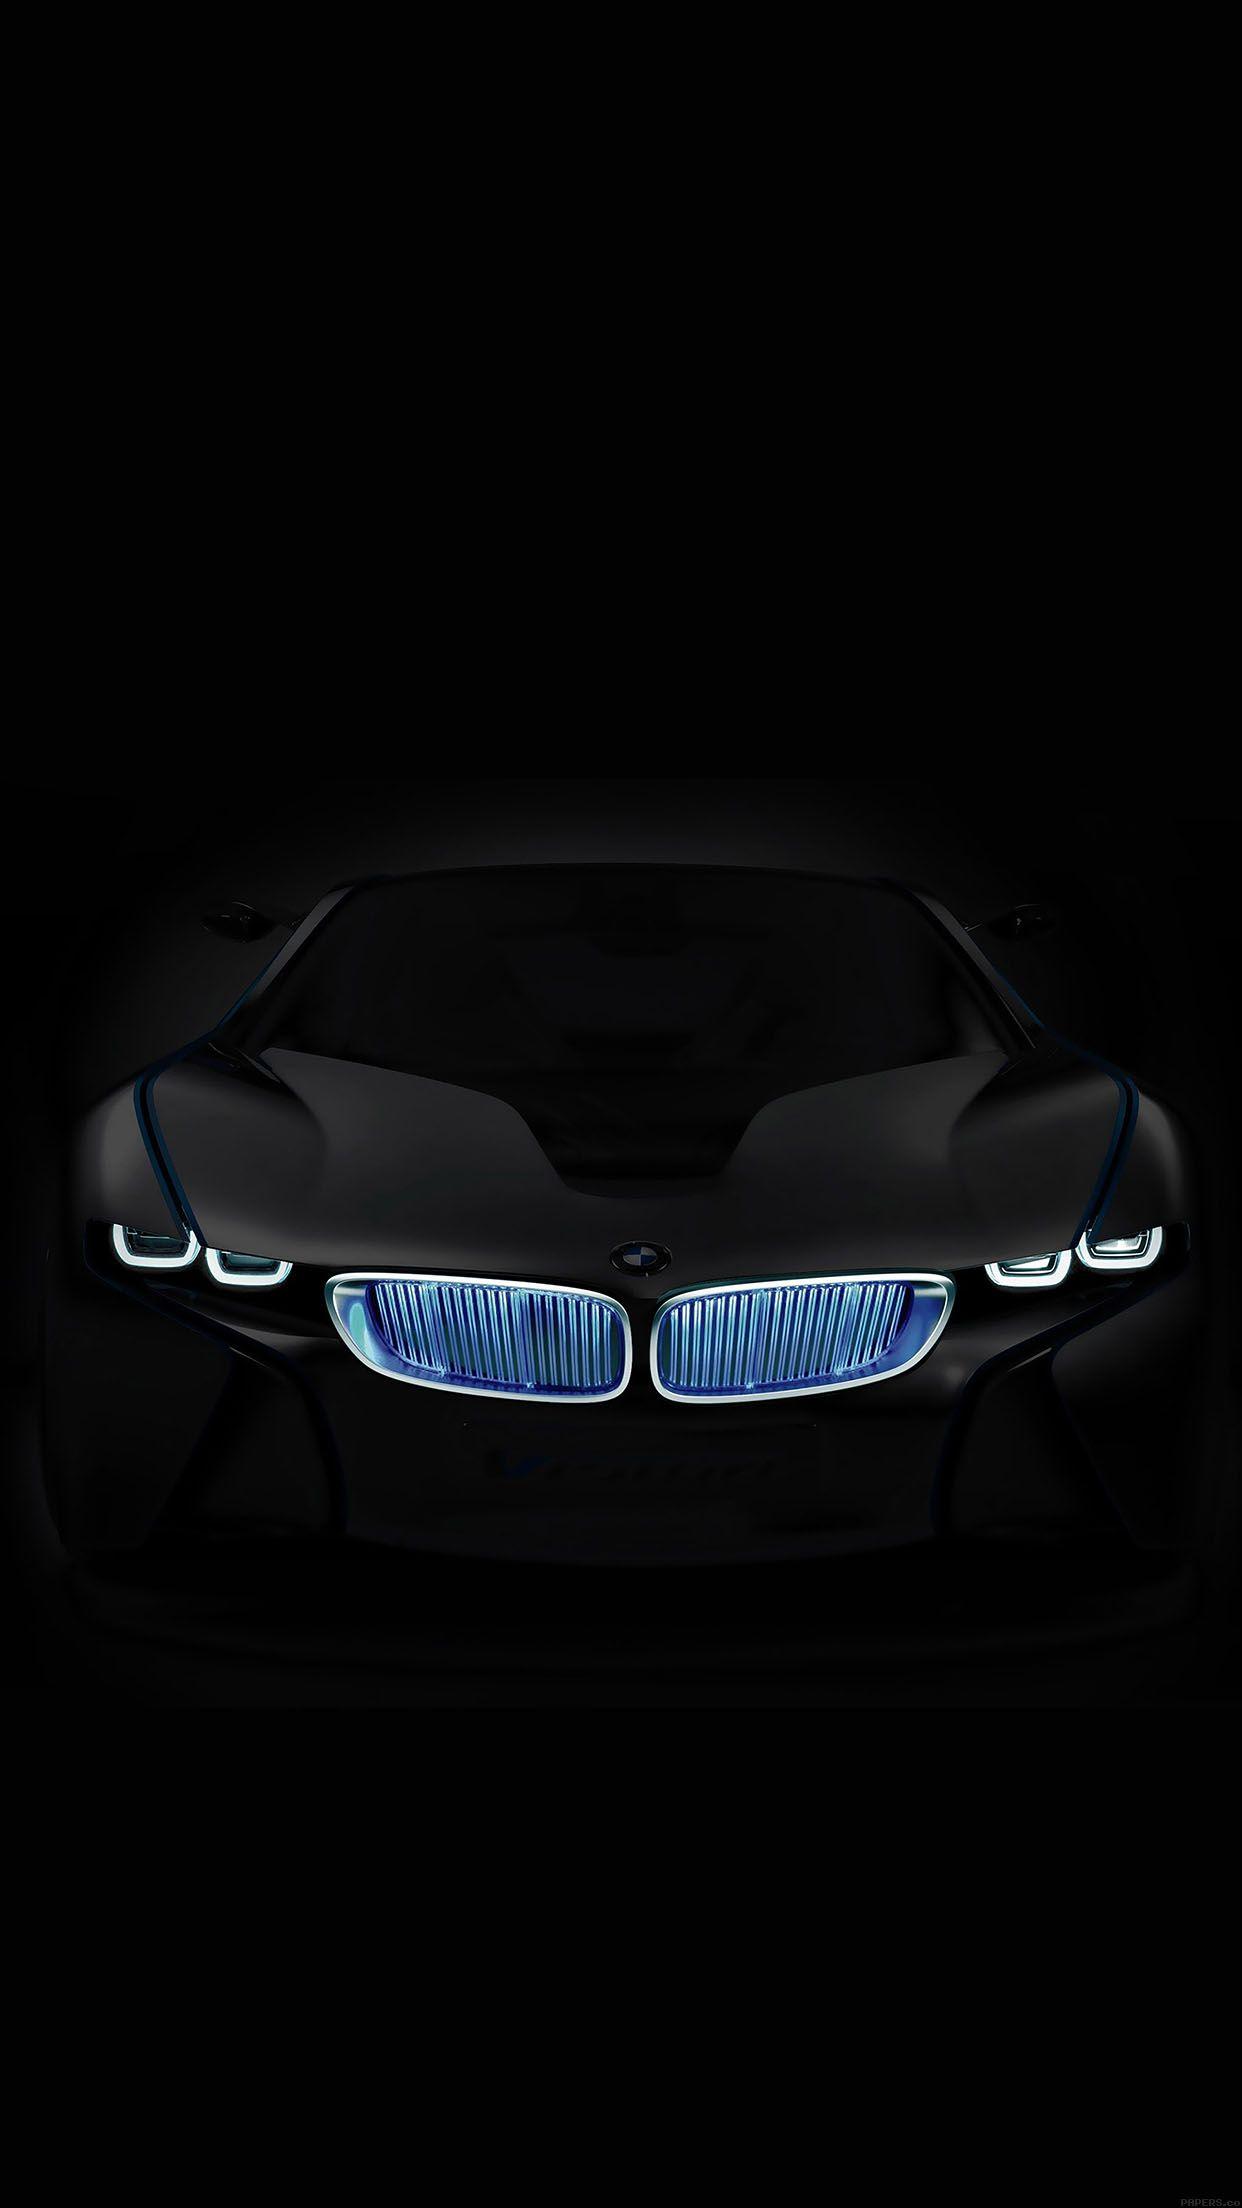 Bmw Logo Iphone Wallpaper. P3 BMW HUD Pinterest BMW